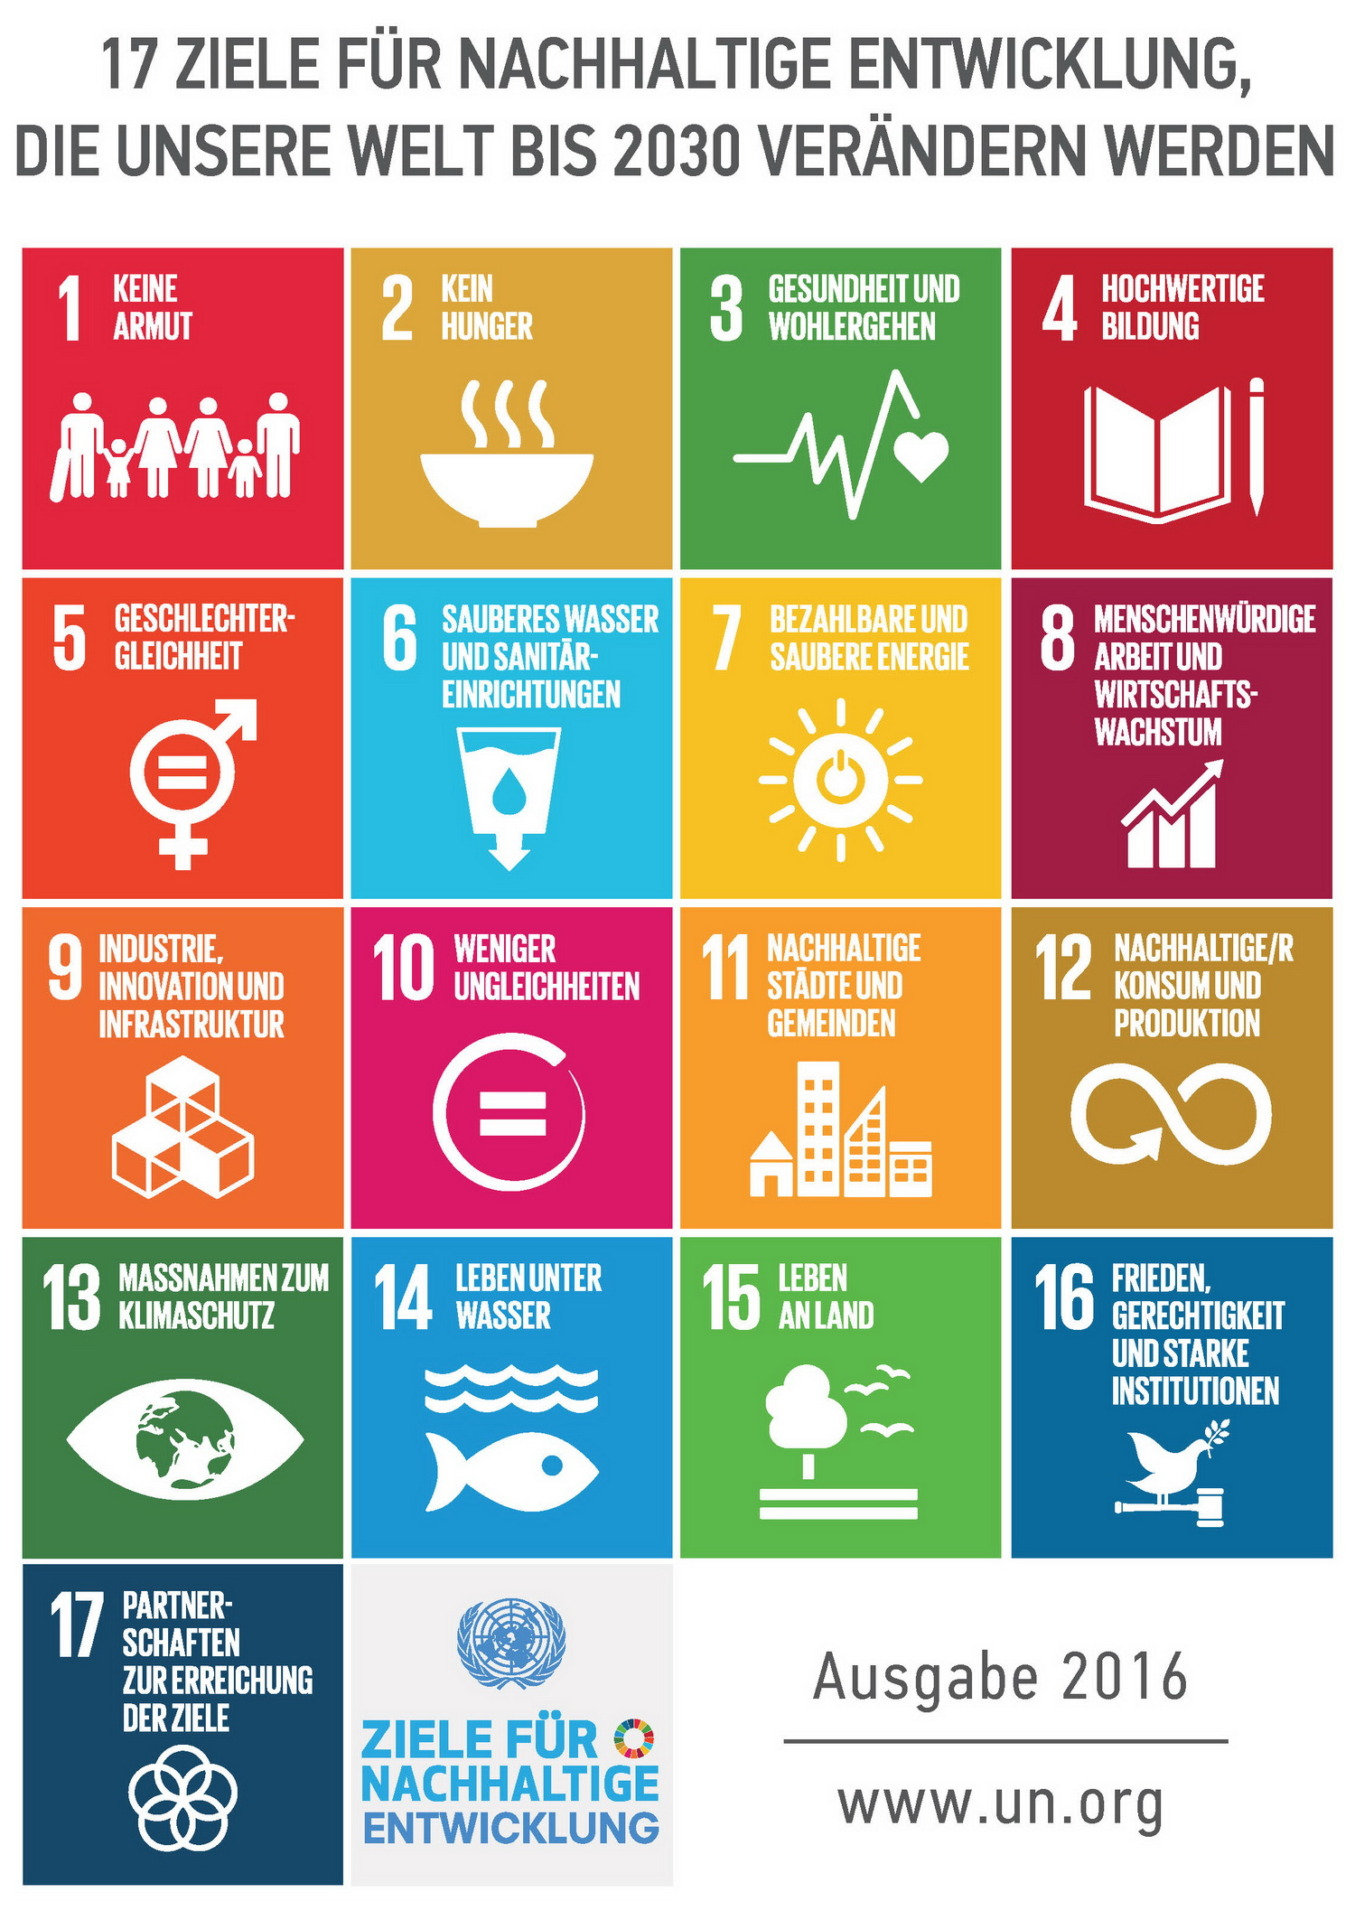 Bild-17-SDGs-UN